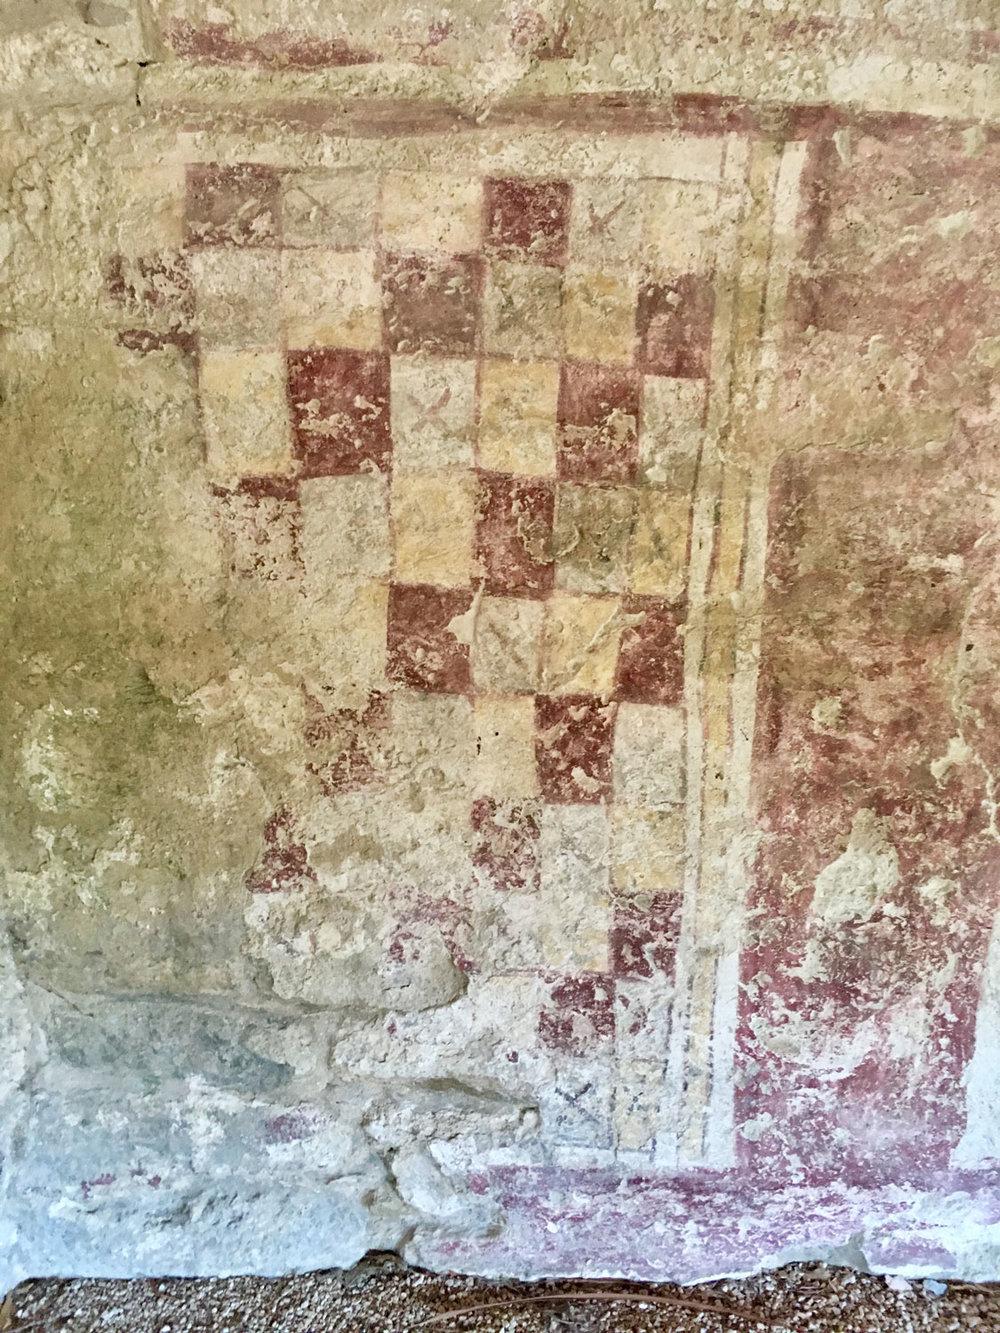 Mural 2: the checkerboard motif.